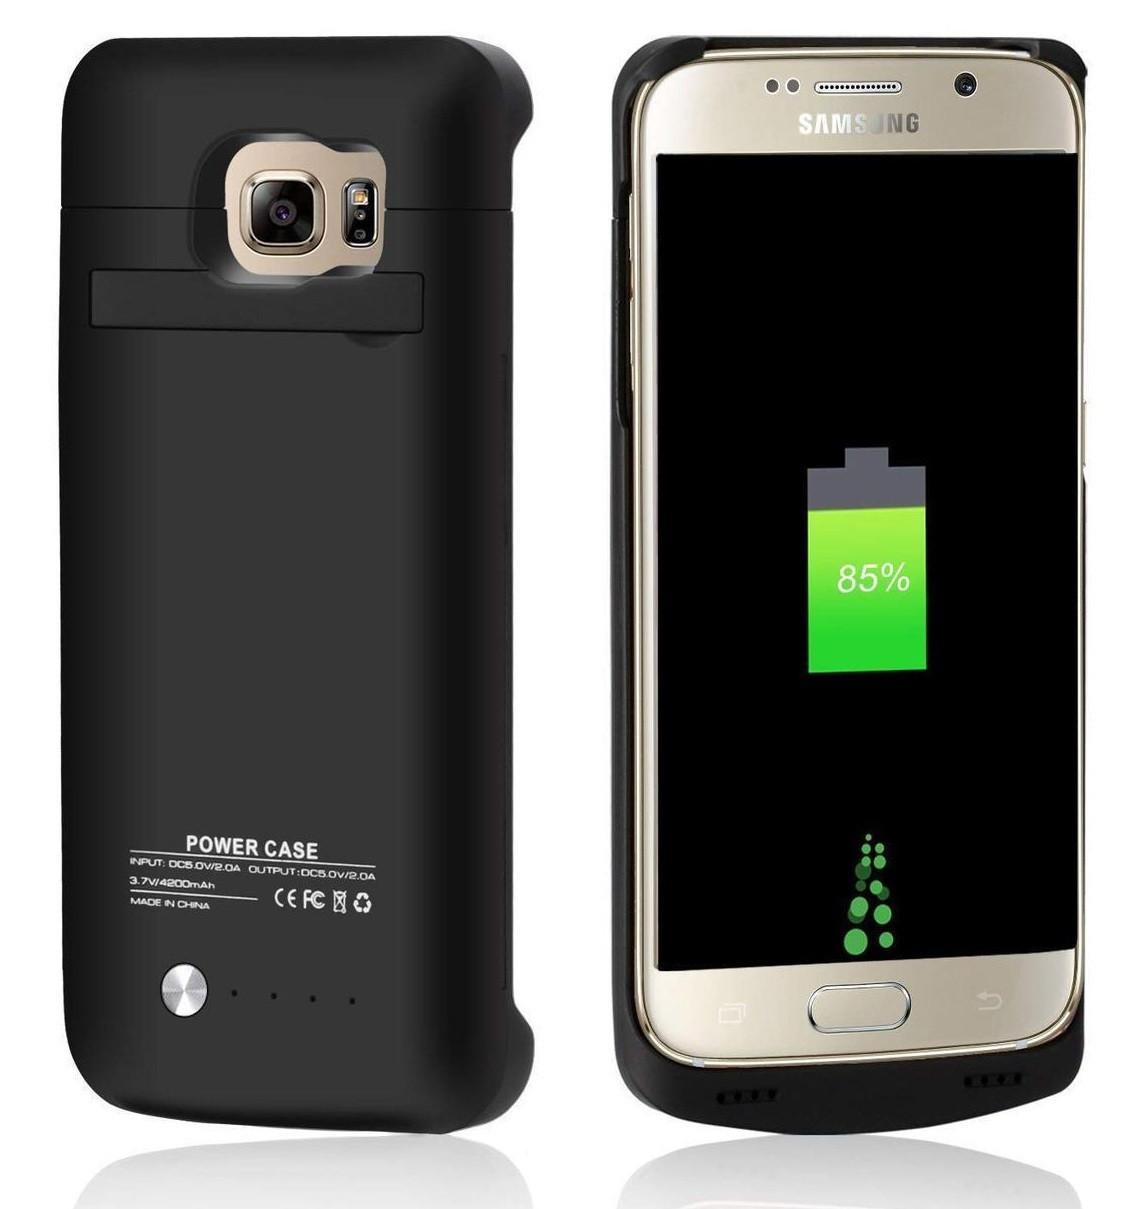 Power Bank Battery Case SAMSUNG (G928) S6+ 5200mAh Black Гарантия 6 месяцев